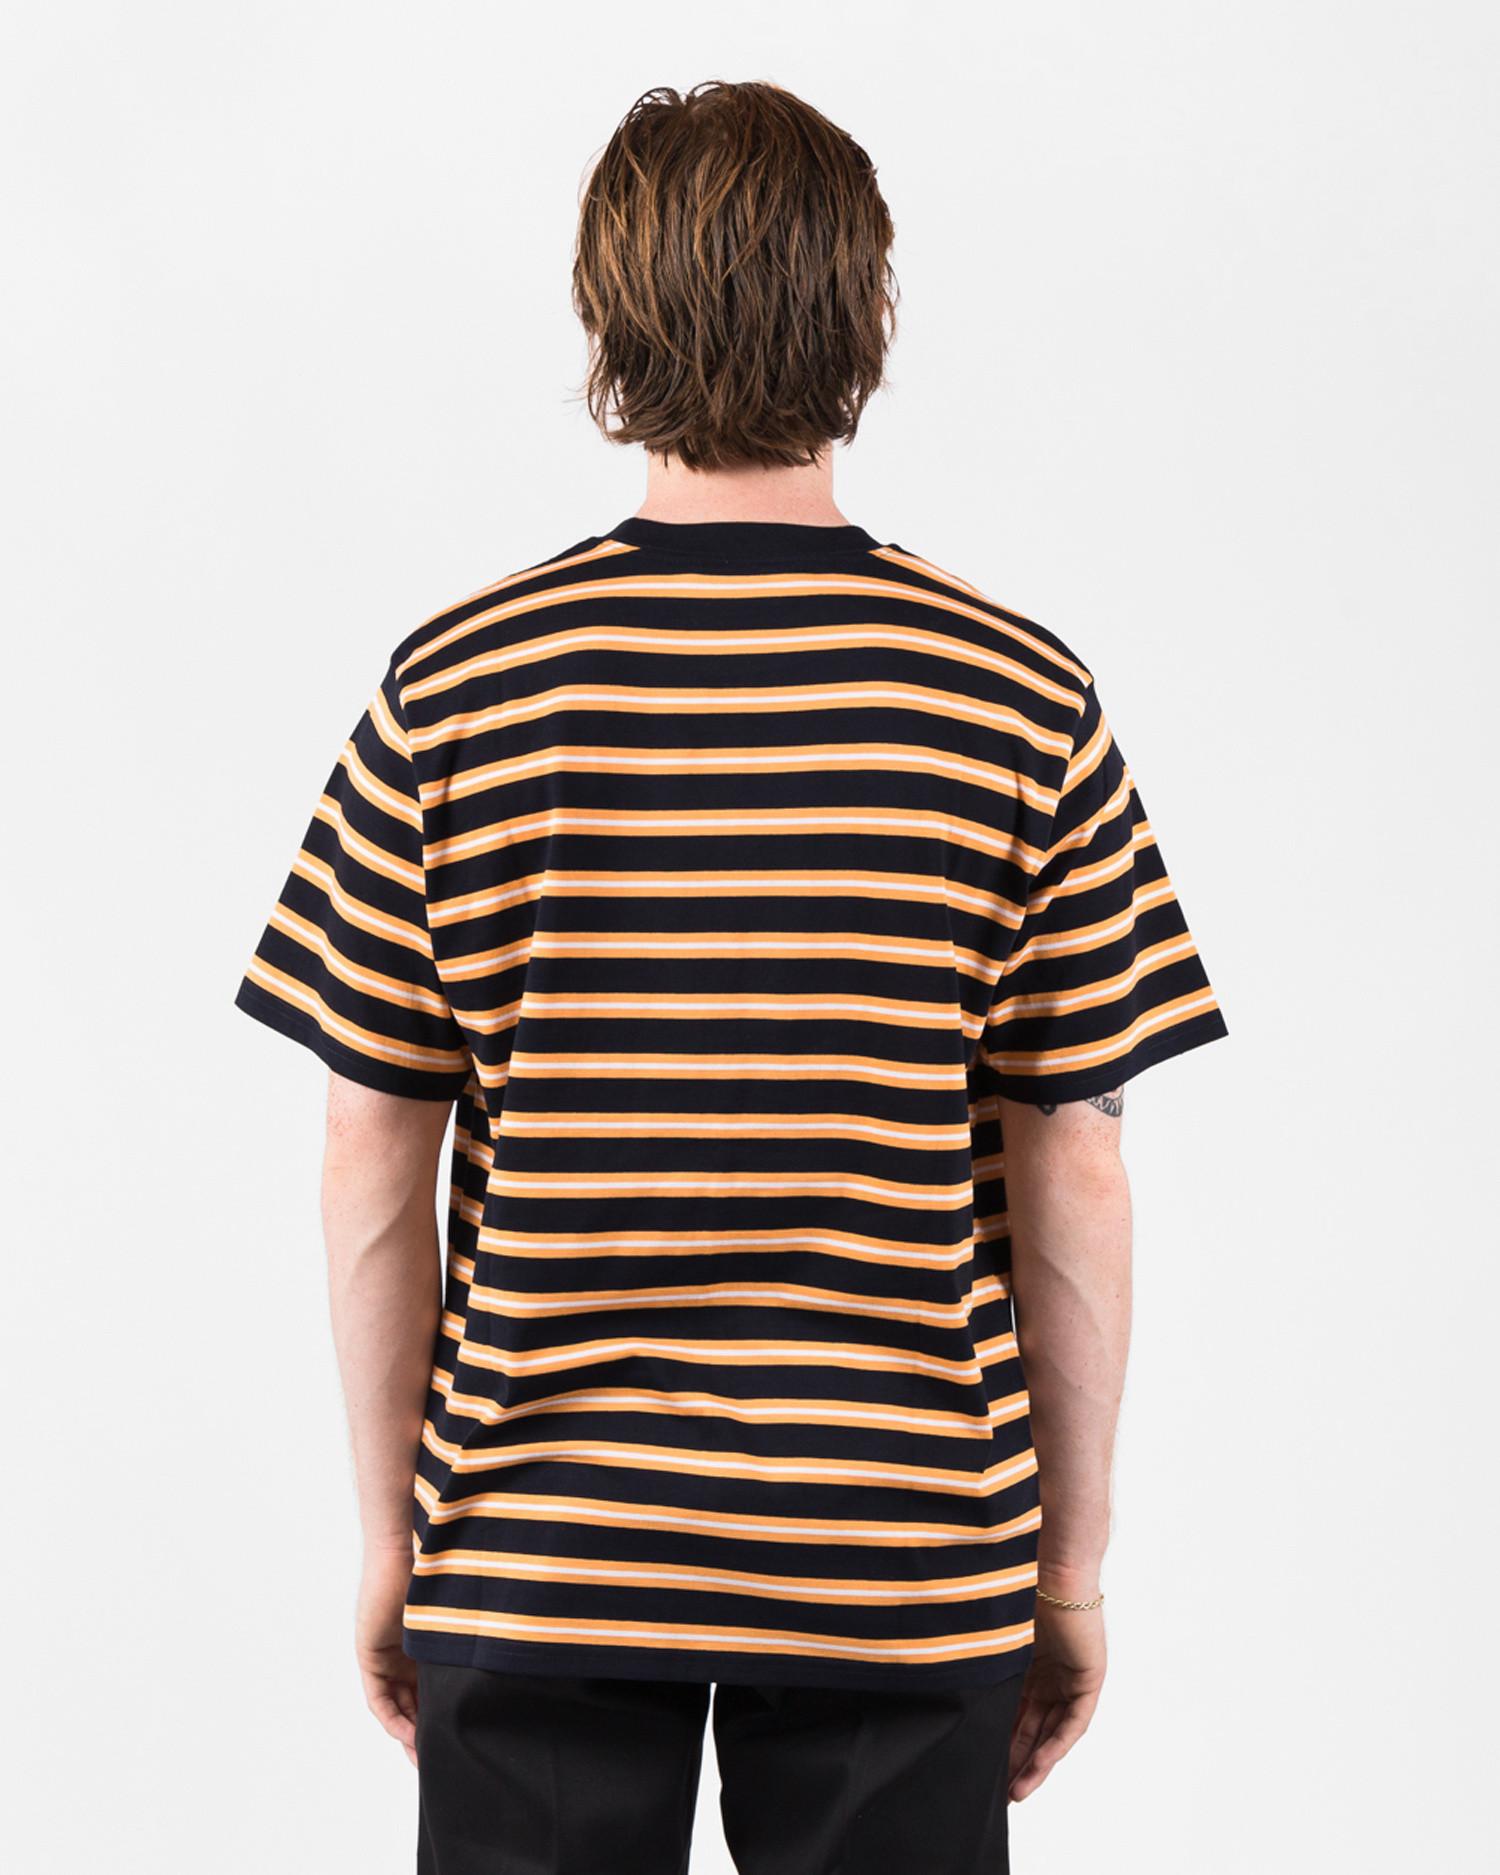 Carhartt Oakland Shortsleeve T-Shirt Stripee Dark Navy / Pop Orange stripe